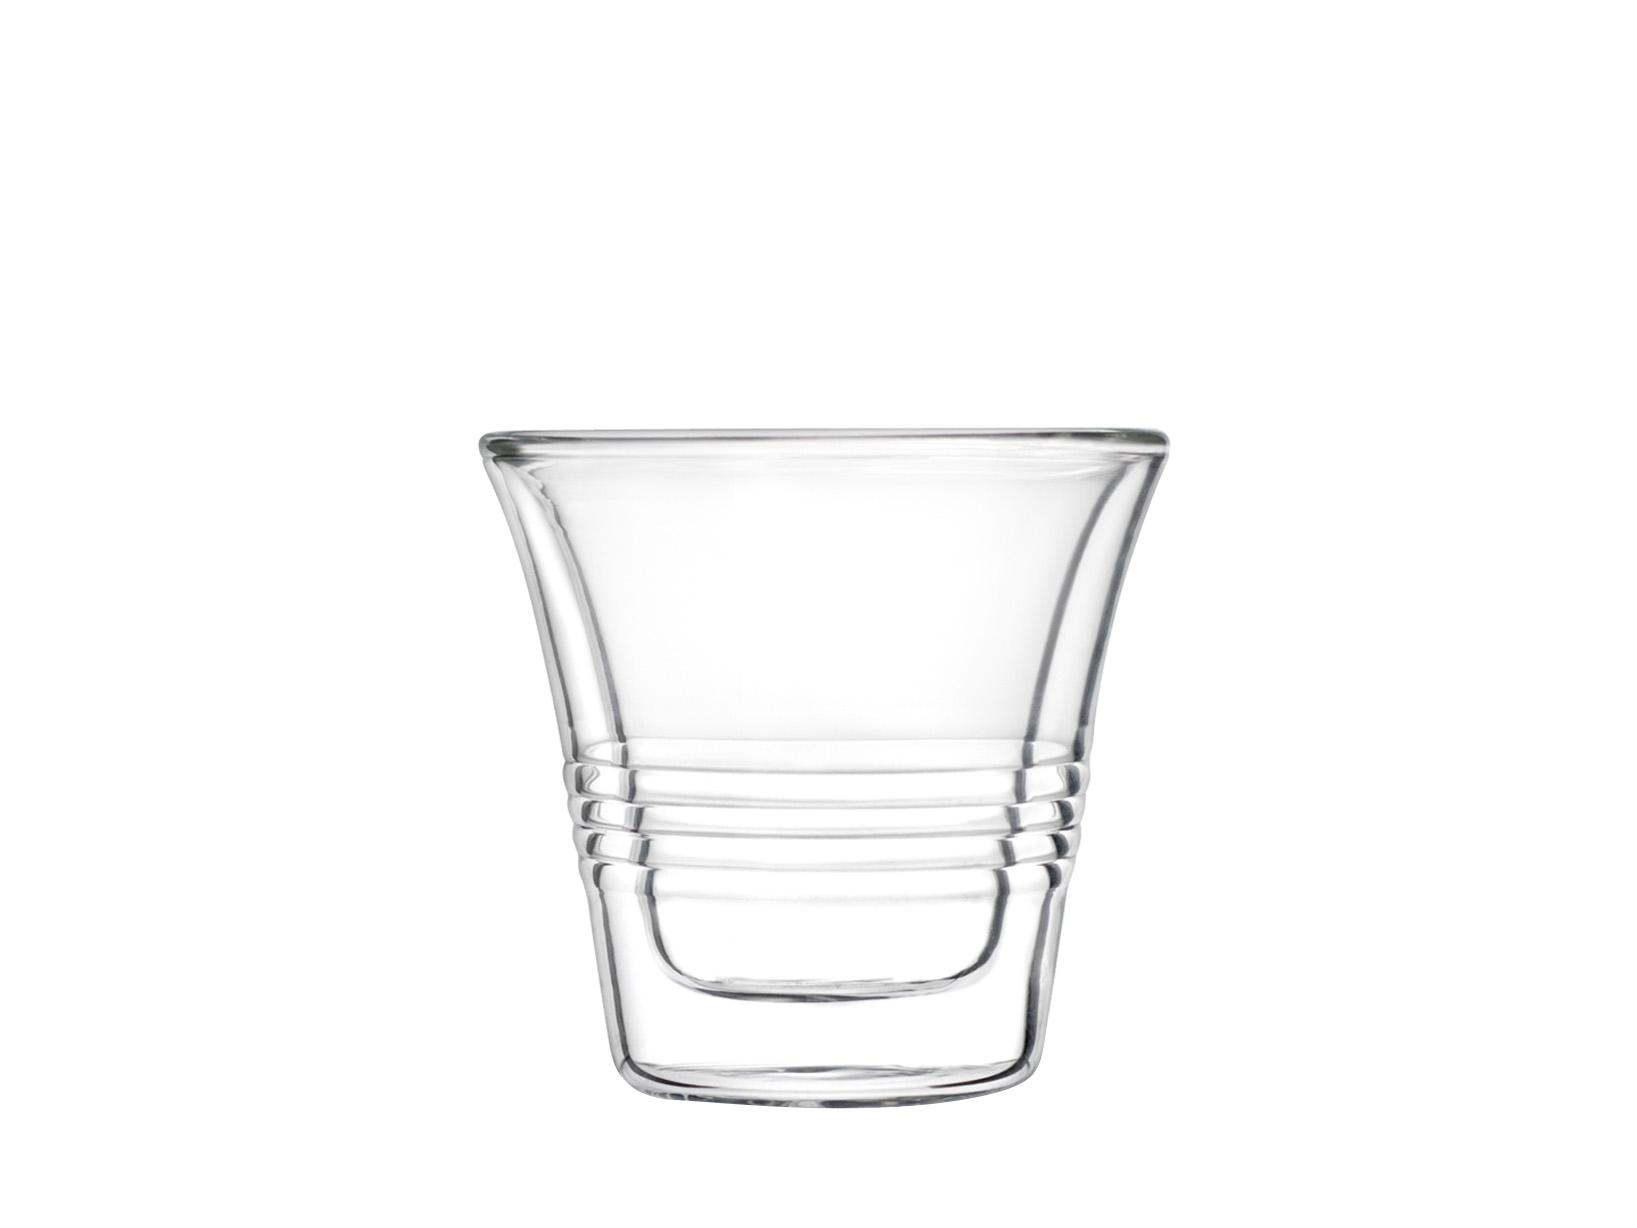 Set 4 Bicchieri Termici In Borosilicato, 70 Ml, Trasparente